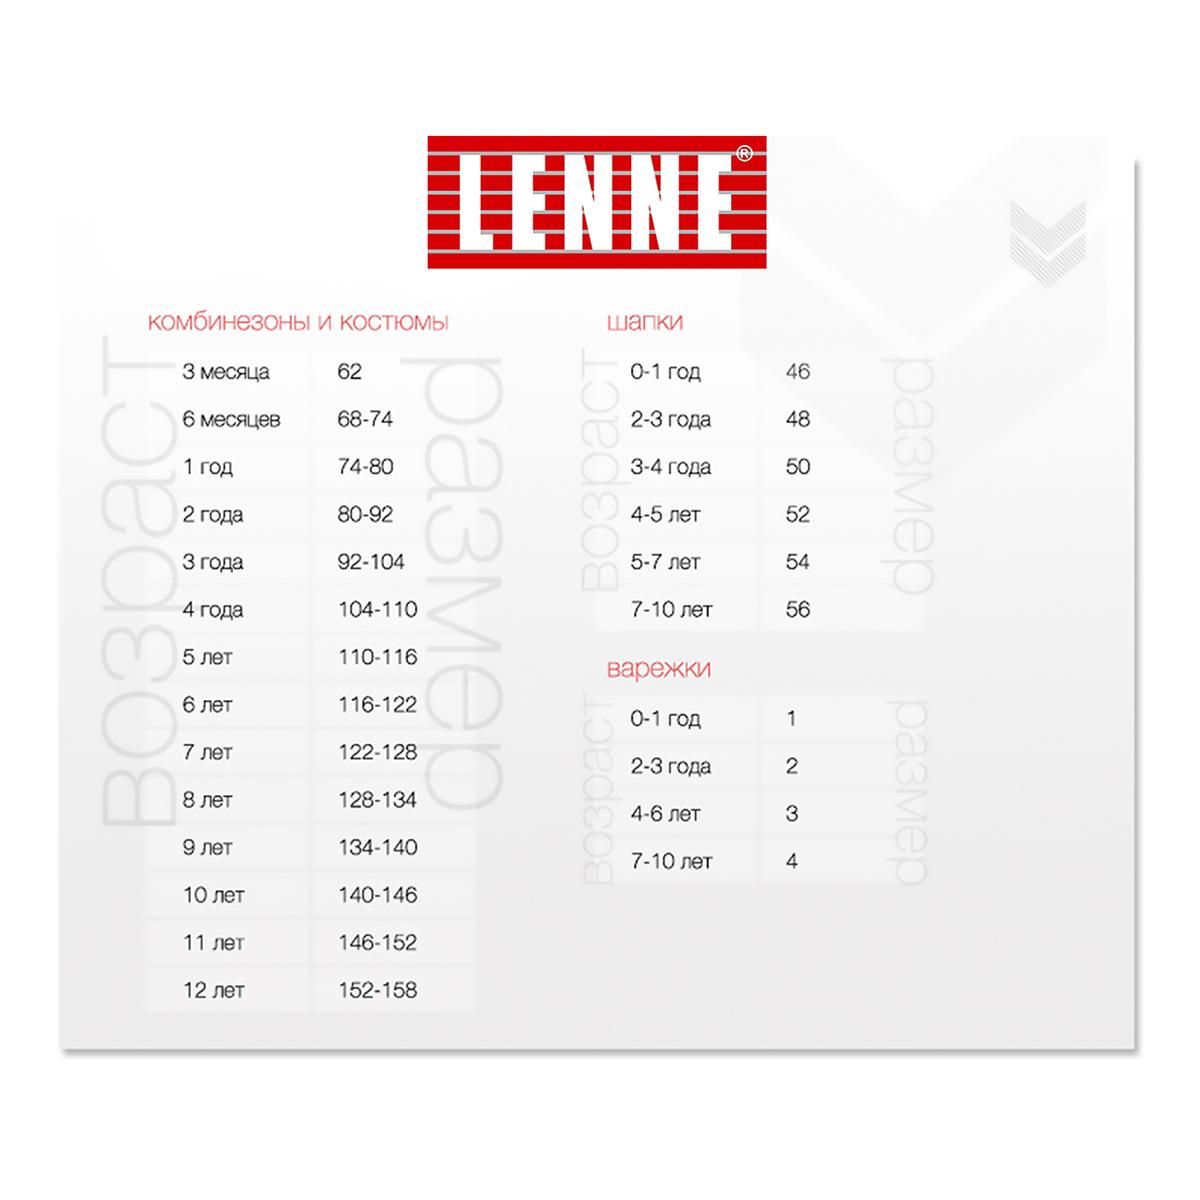 Купить Верхняя одежда, Парка LENNE Moss Red, р. 134 20339/622 ТМ: LENNE, красный